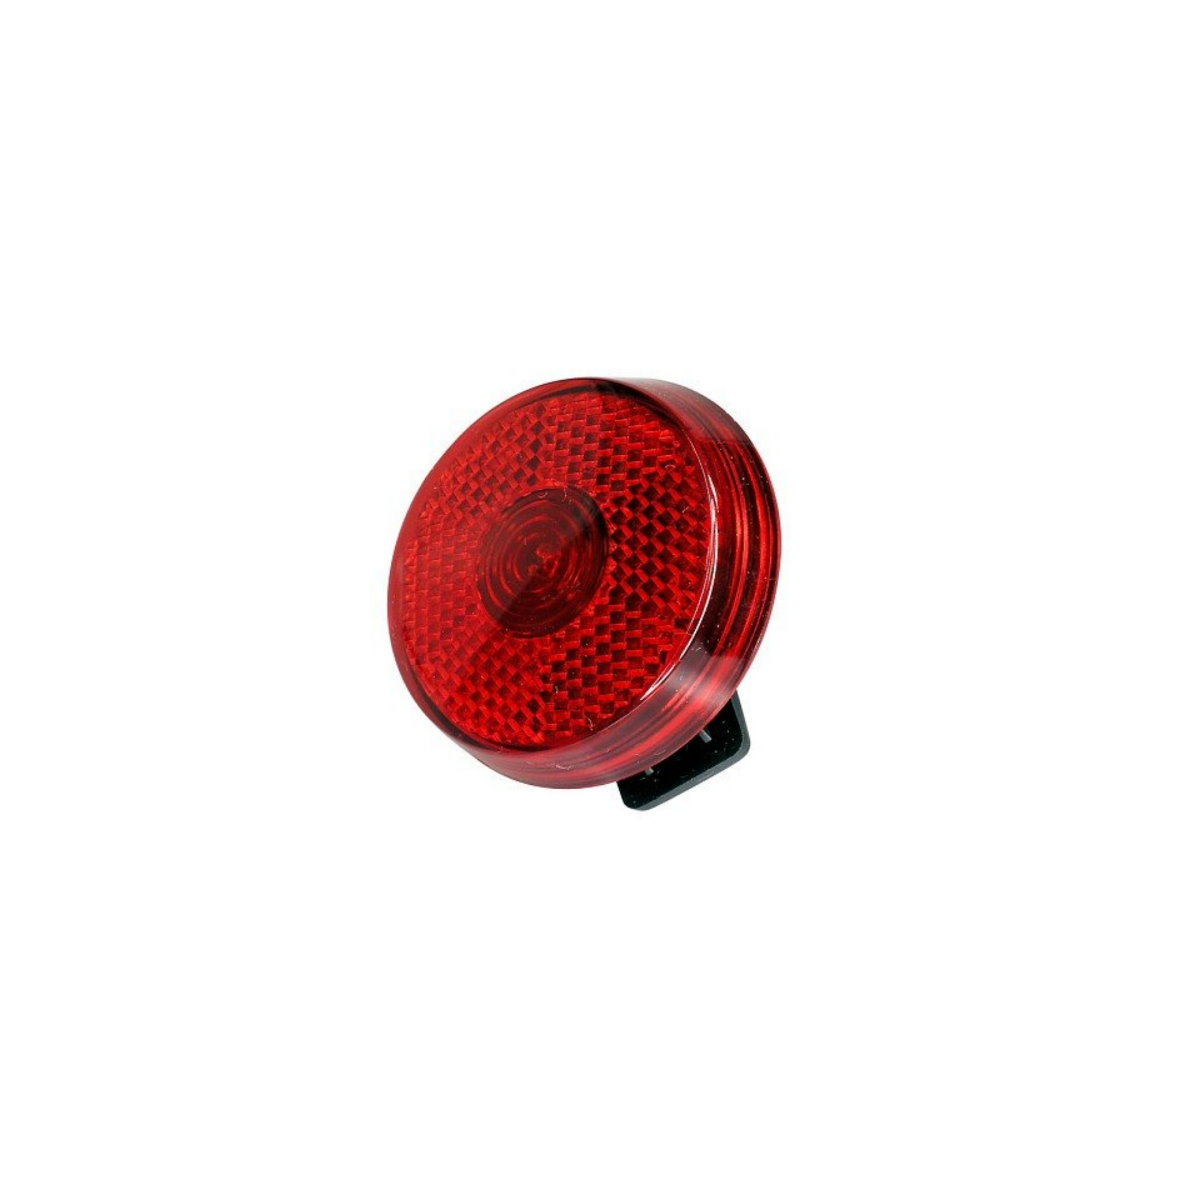 reflektor led blinker sicherheit licht blink 3m reflektorband band jogger nacht ebay. Black Bedroom Furniture Sets. Home Design Ideas